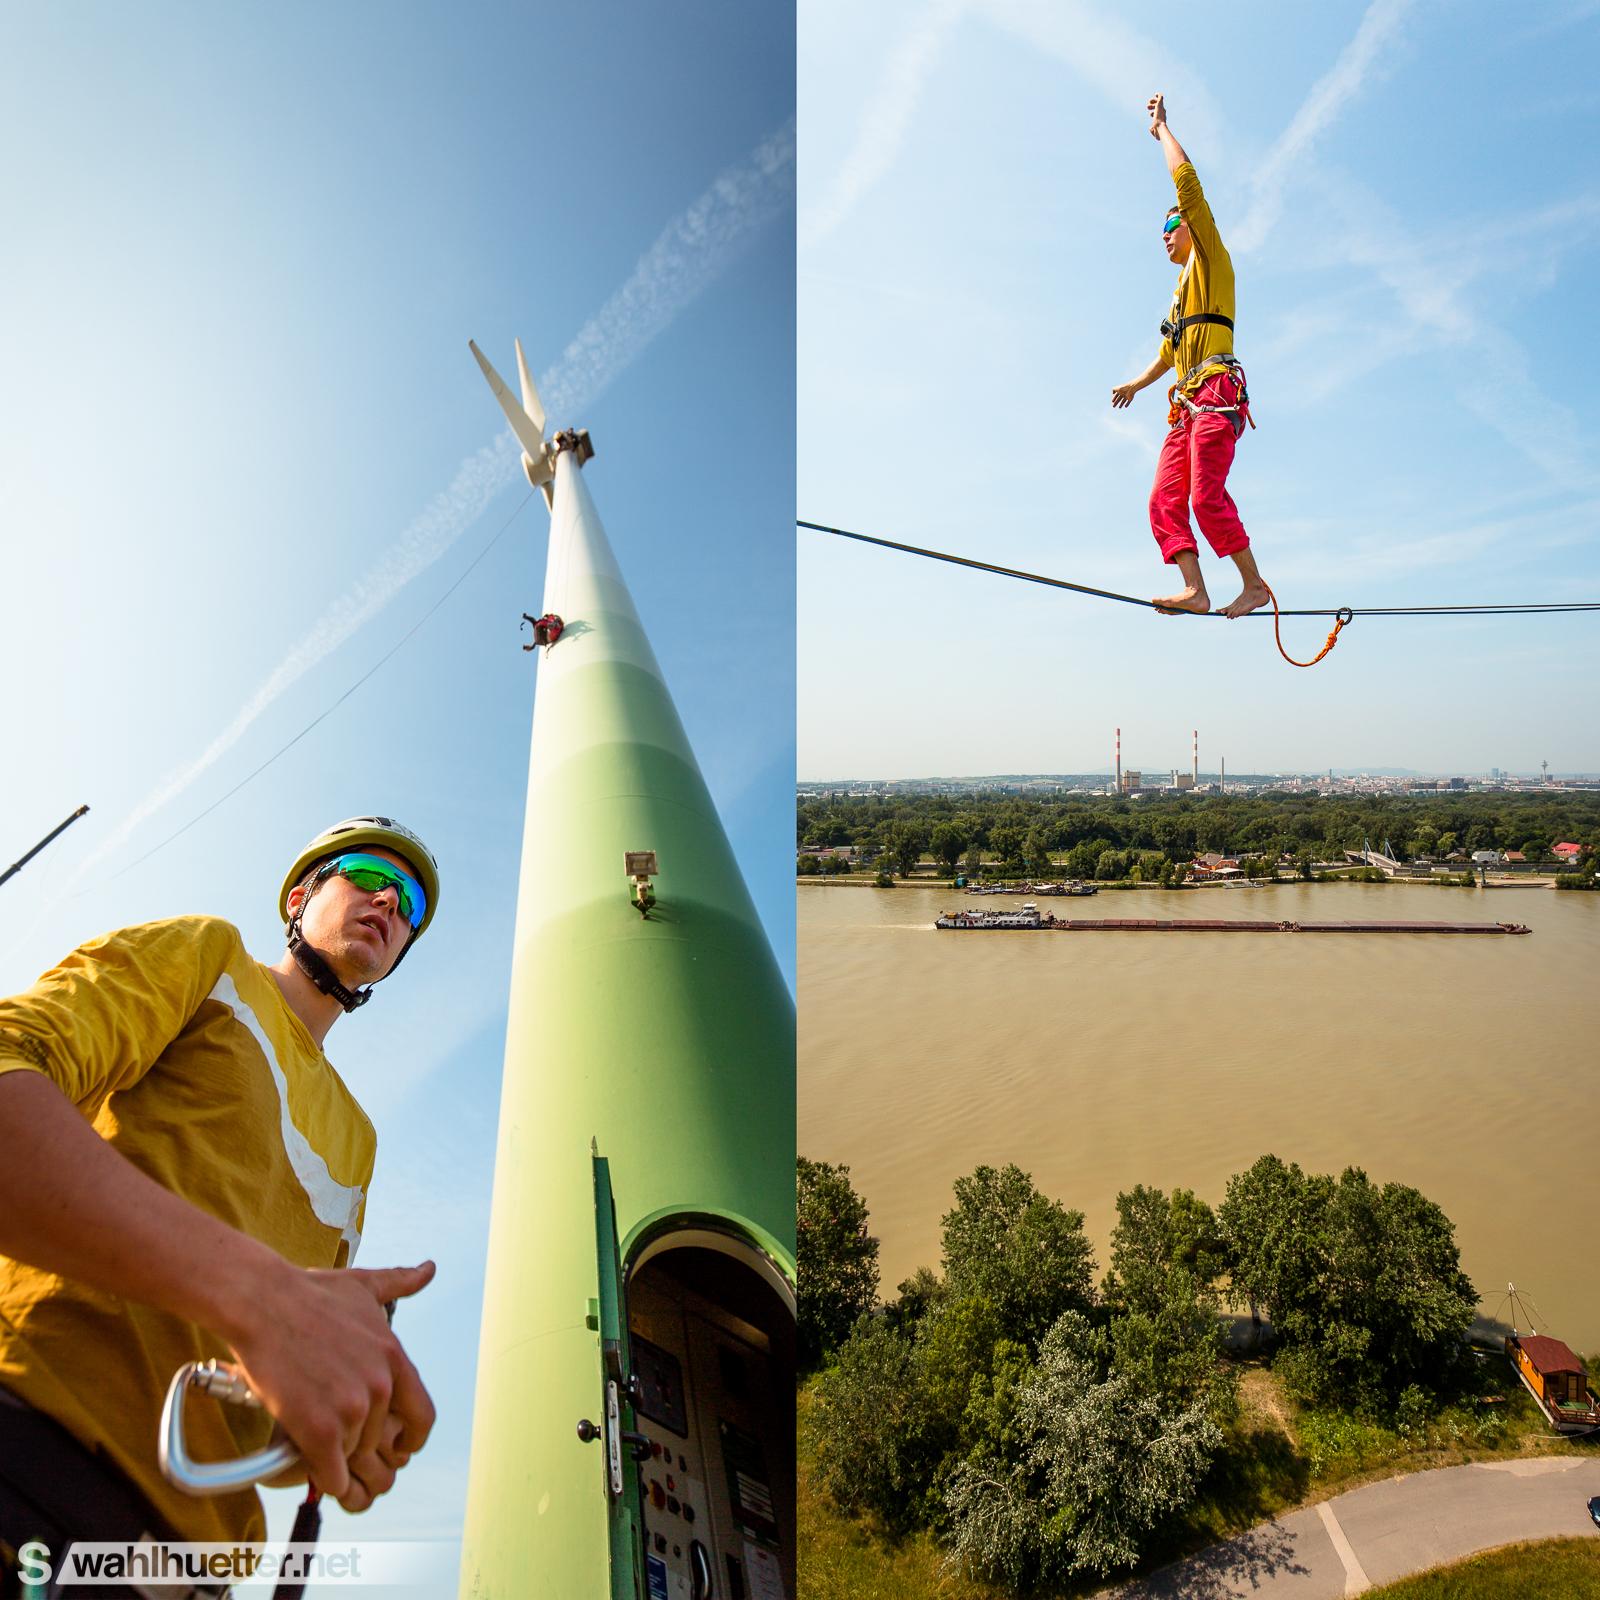 Wind Turbine Highline | Peter Auer | Vienna | www.wahlhuetter.net